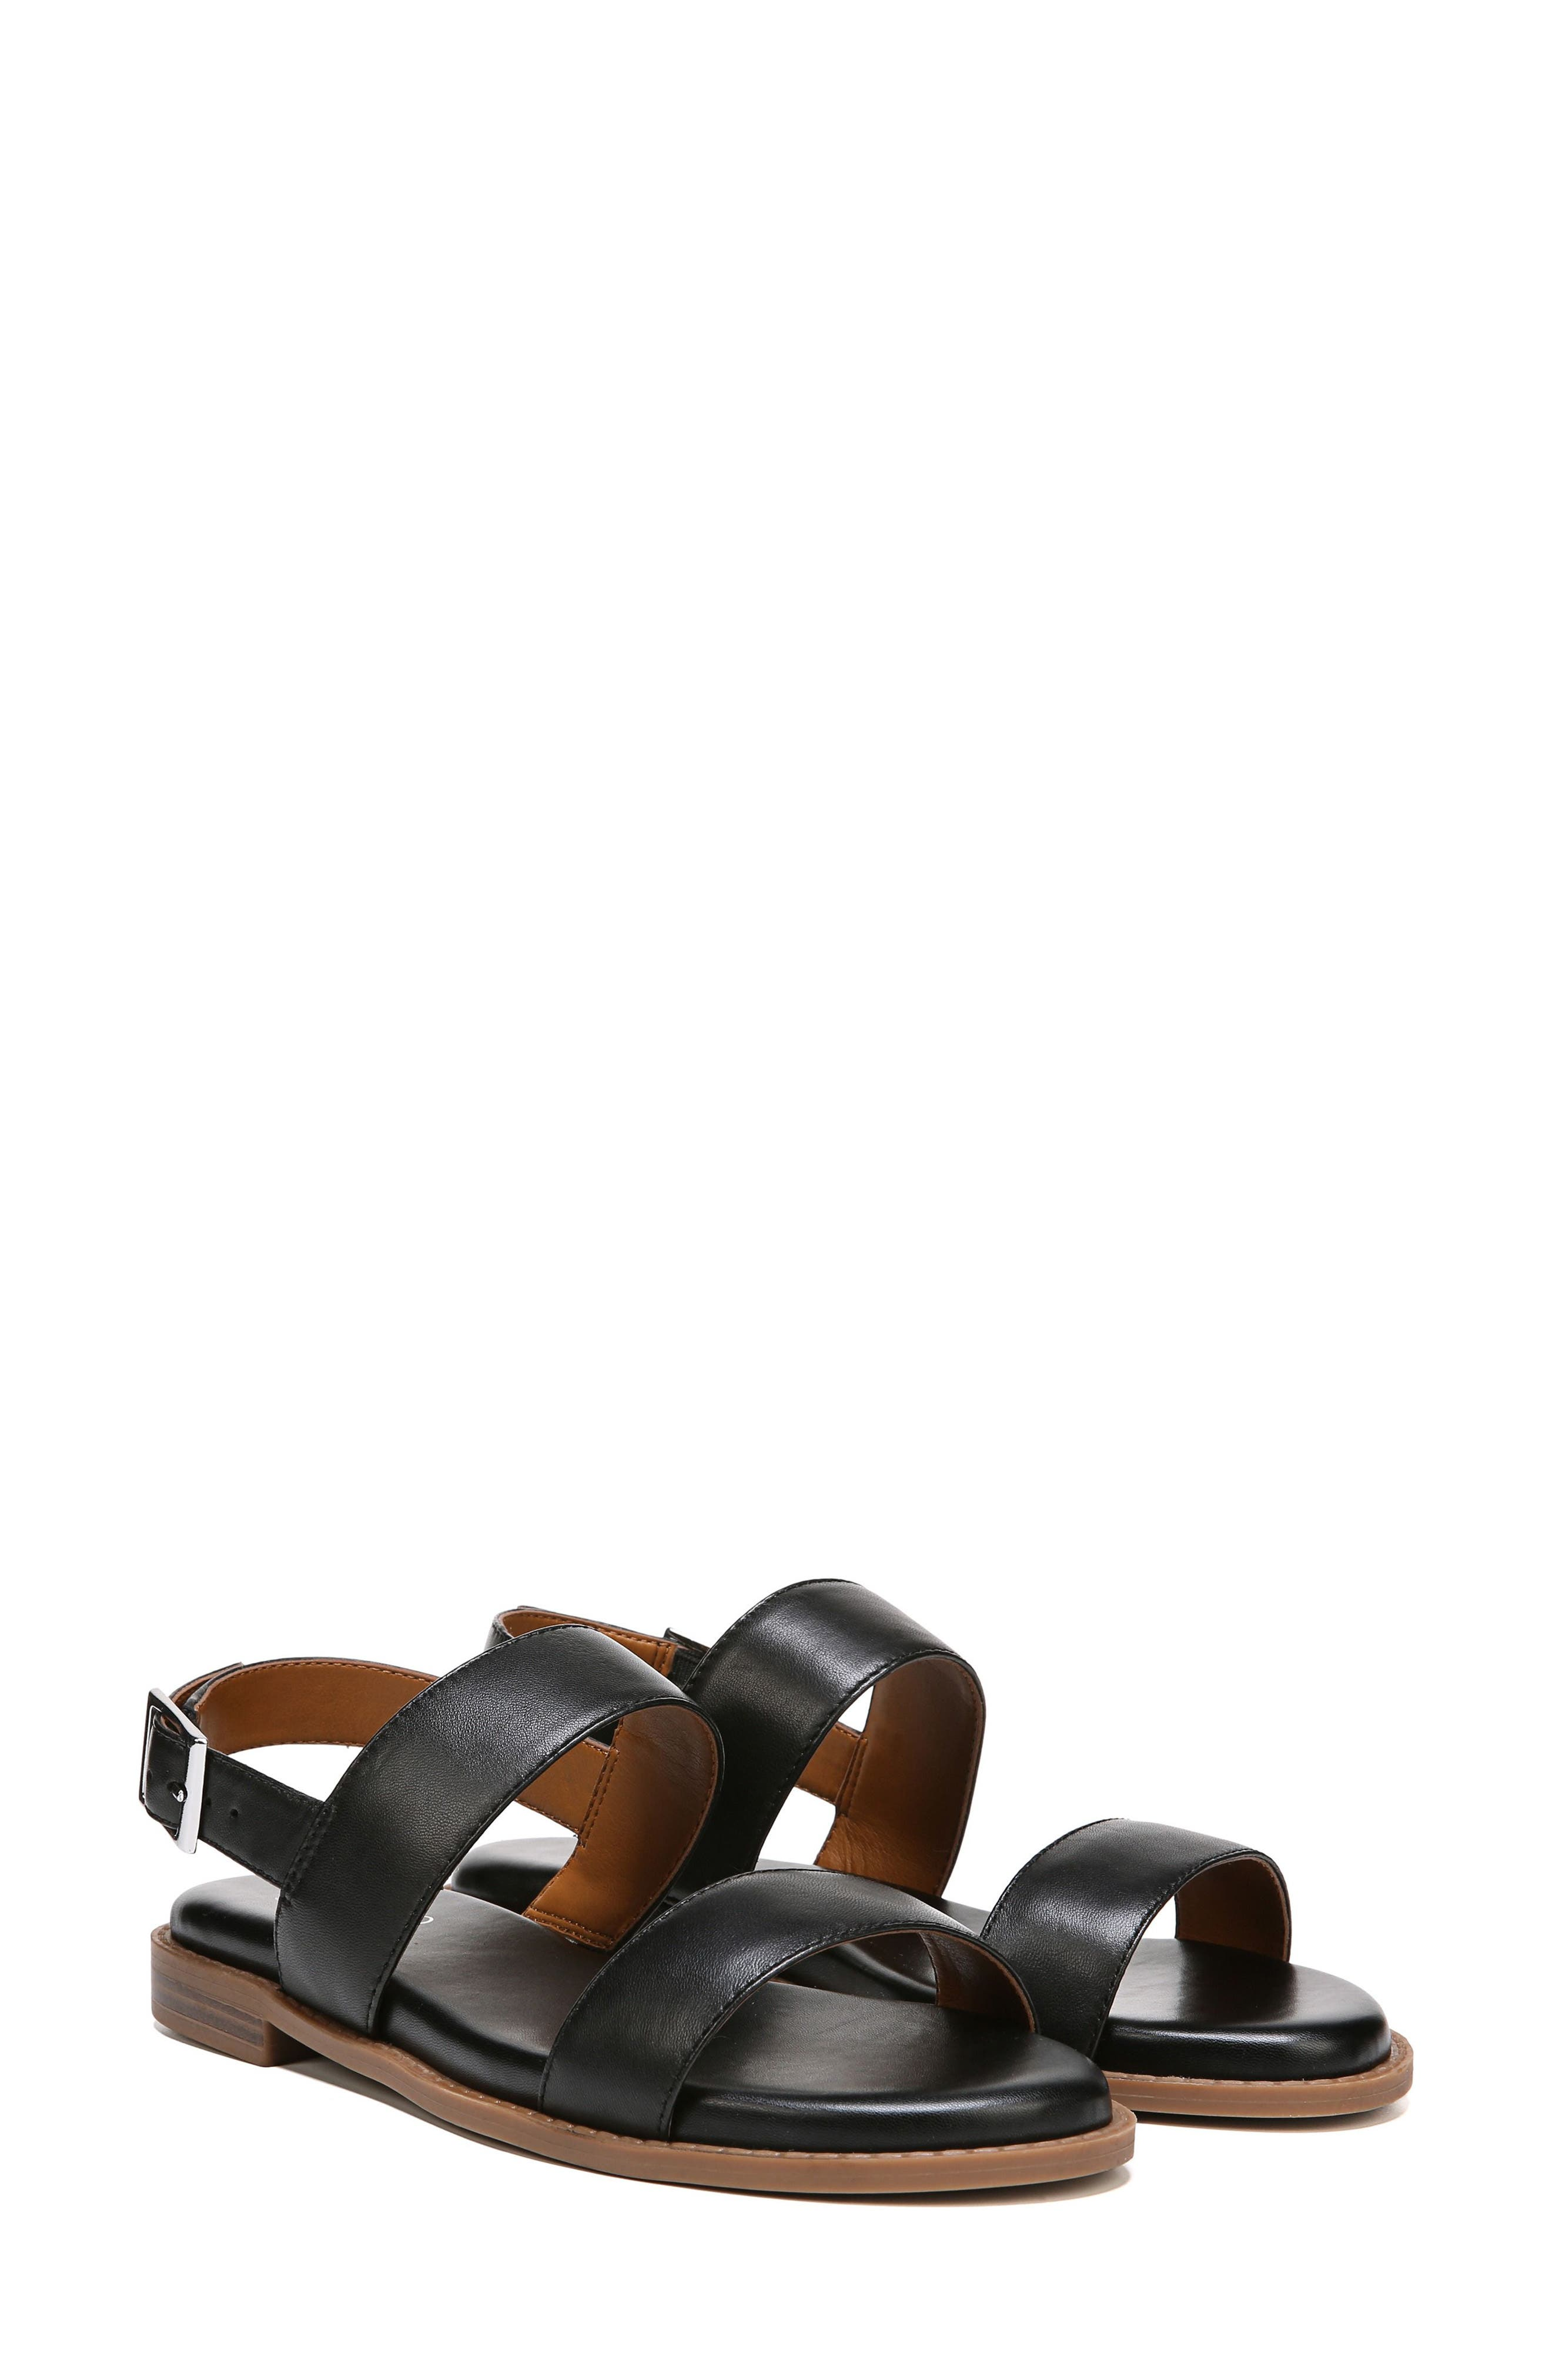 Velocity Sandal,                         Main,                         color, 002